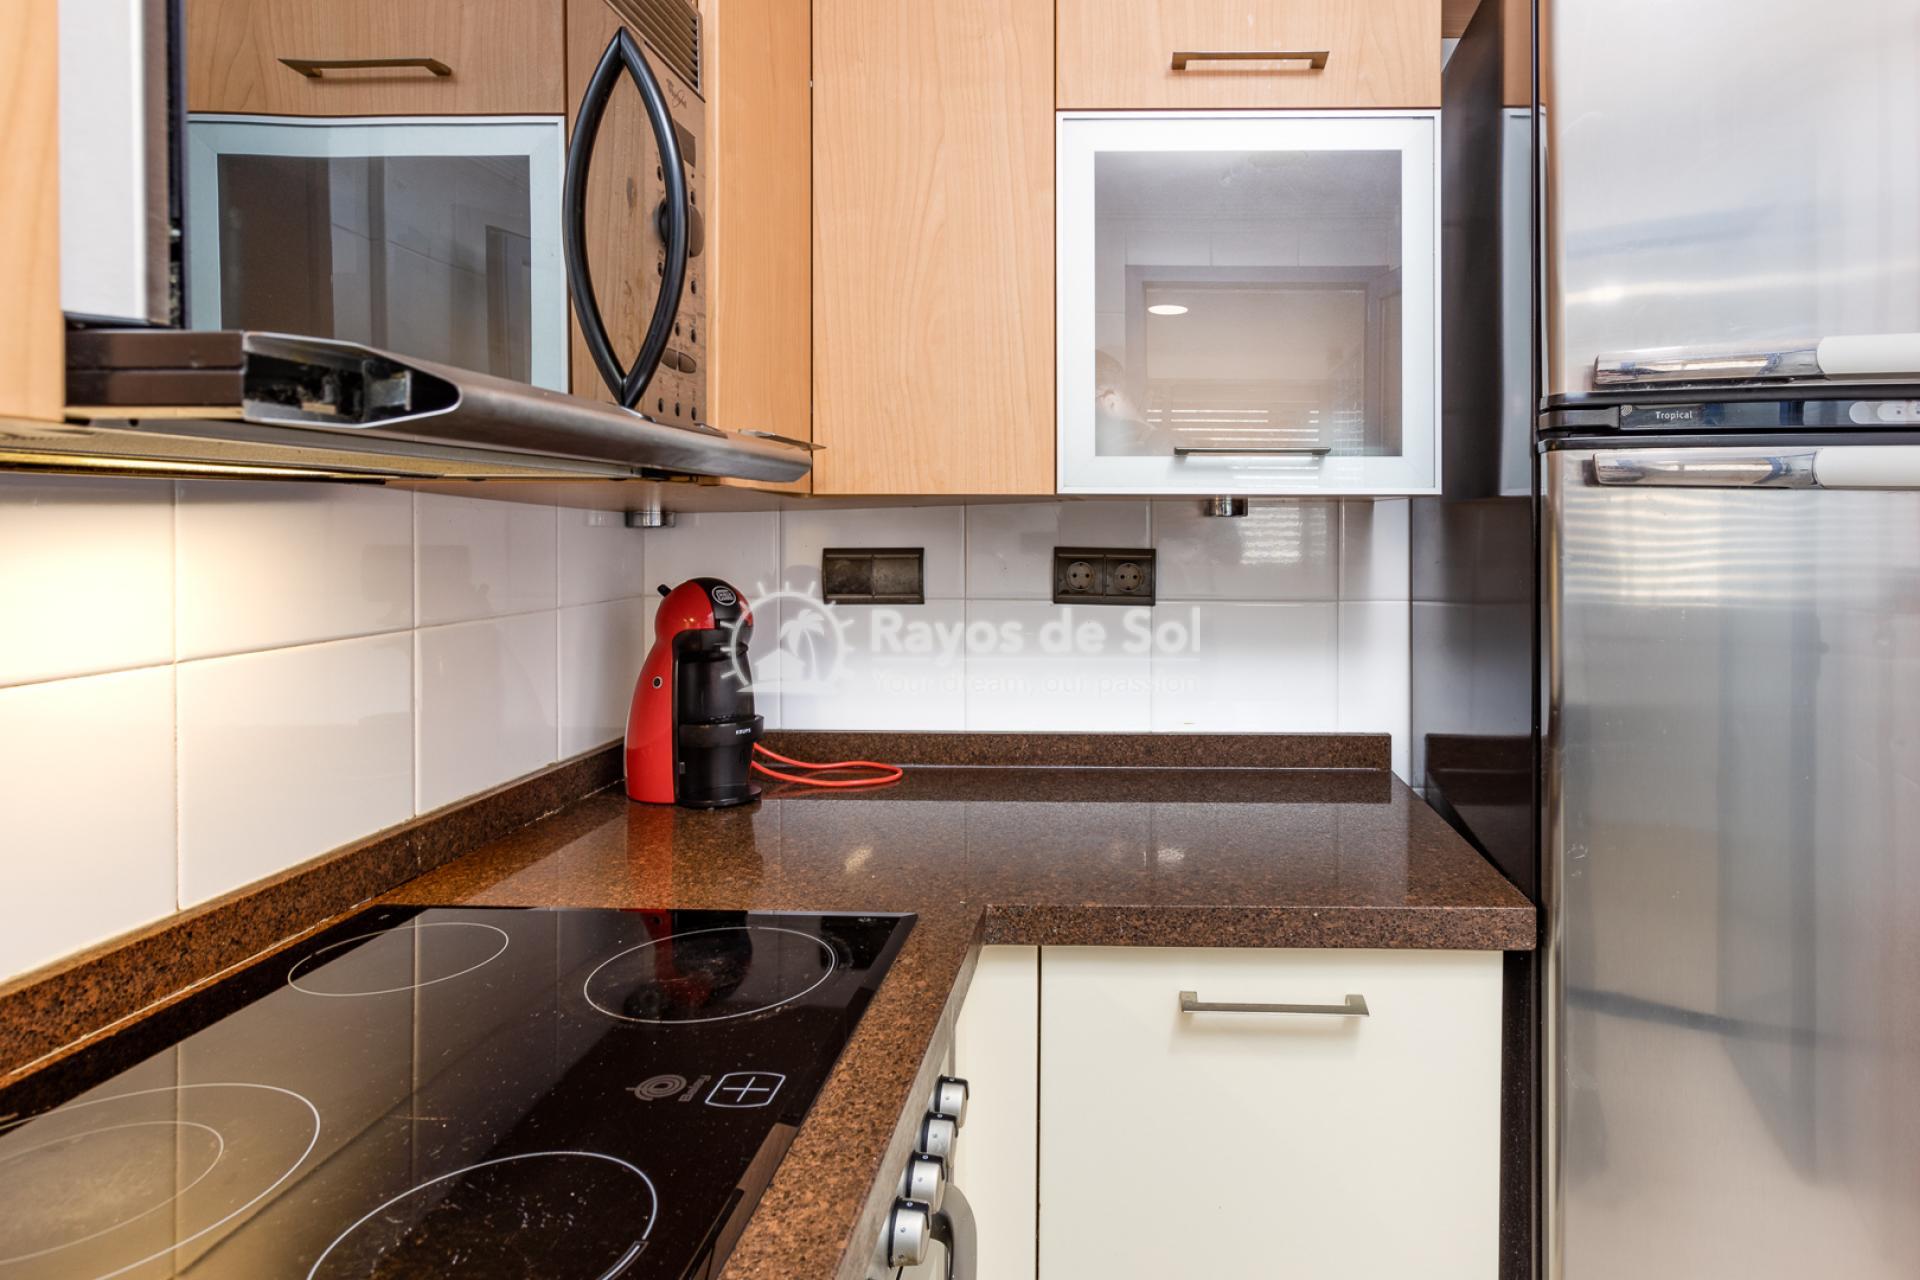 Turnekey first line apartments  in Altea, Costa Blanca (Alteabeach) - 24